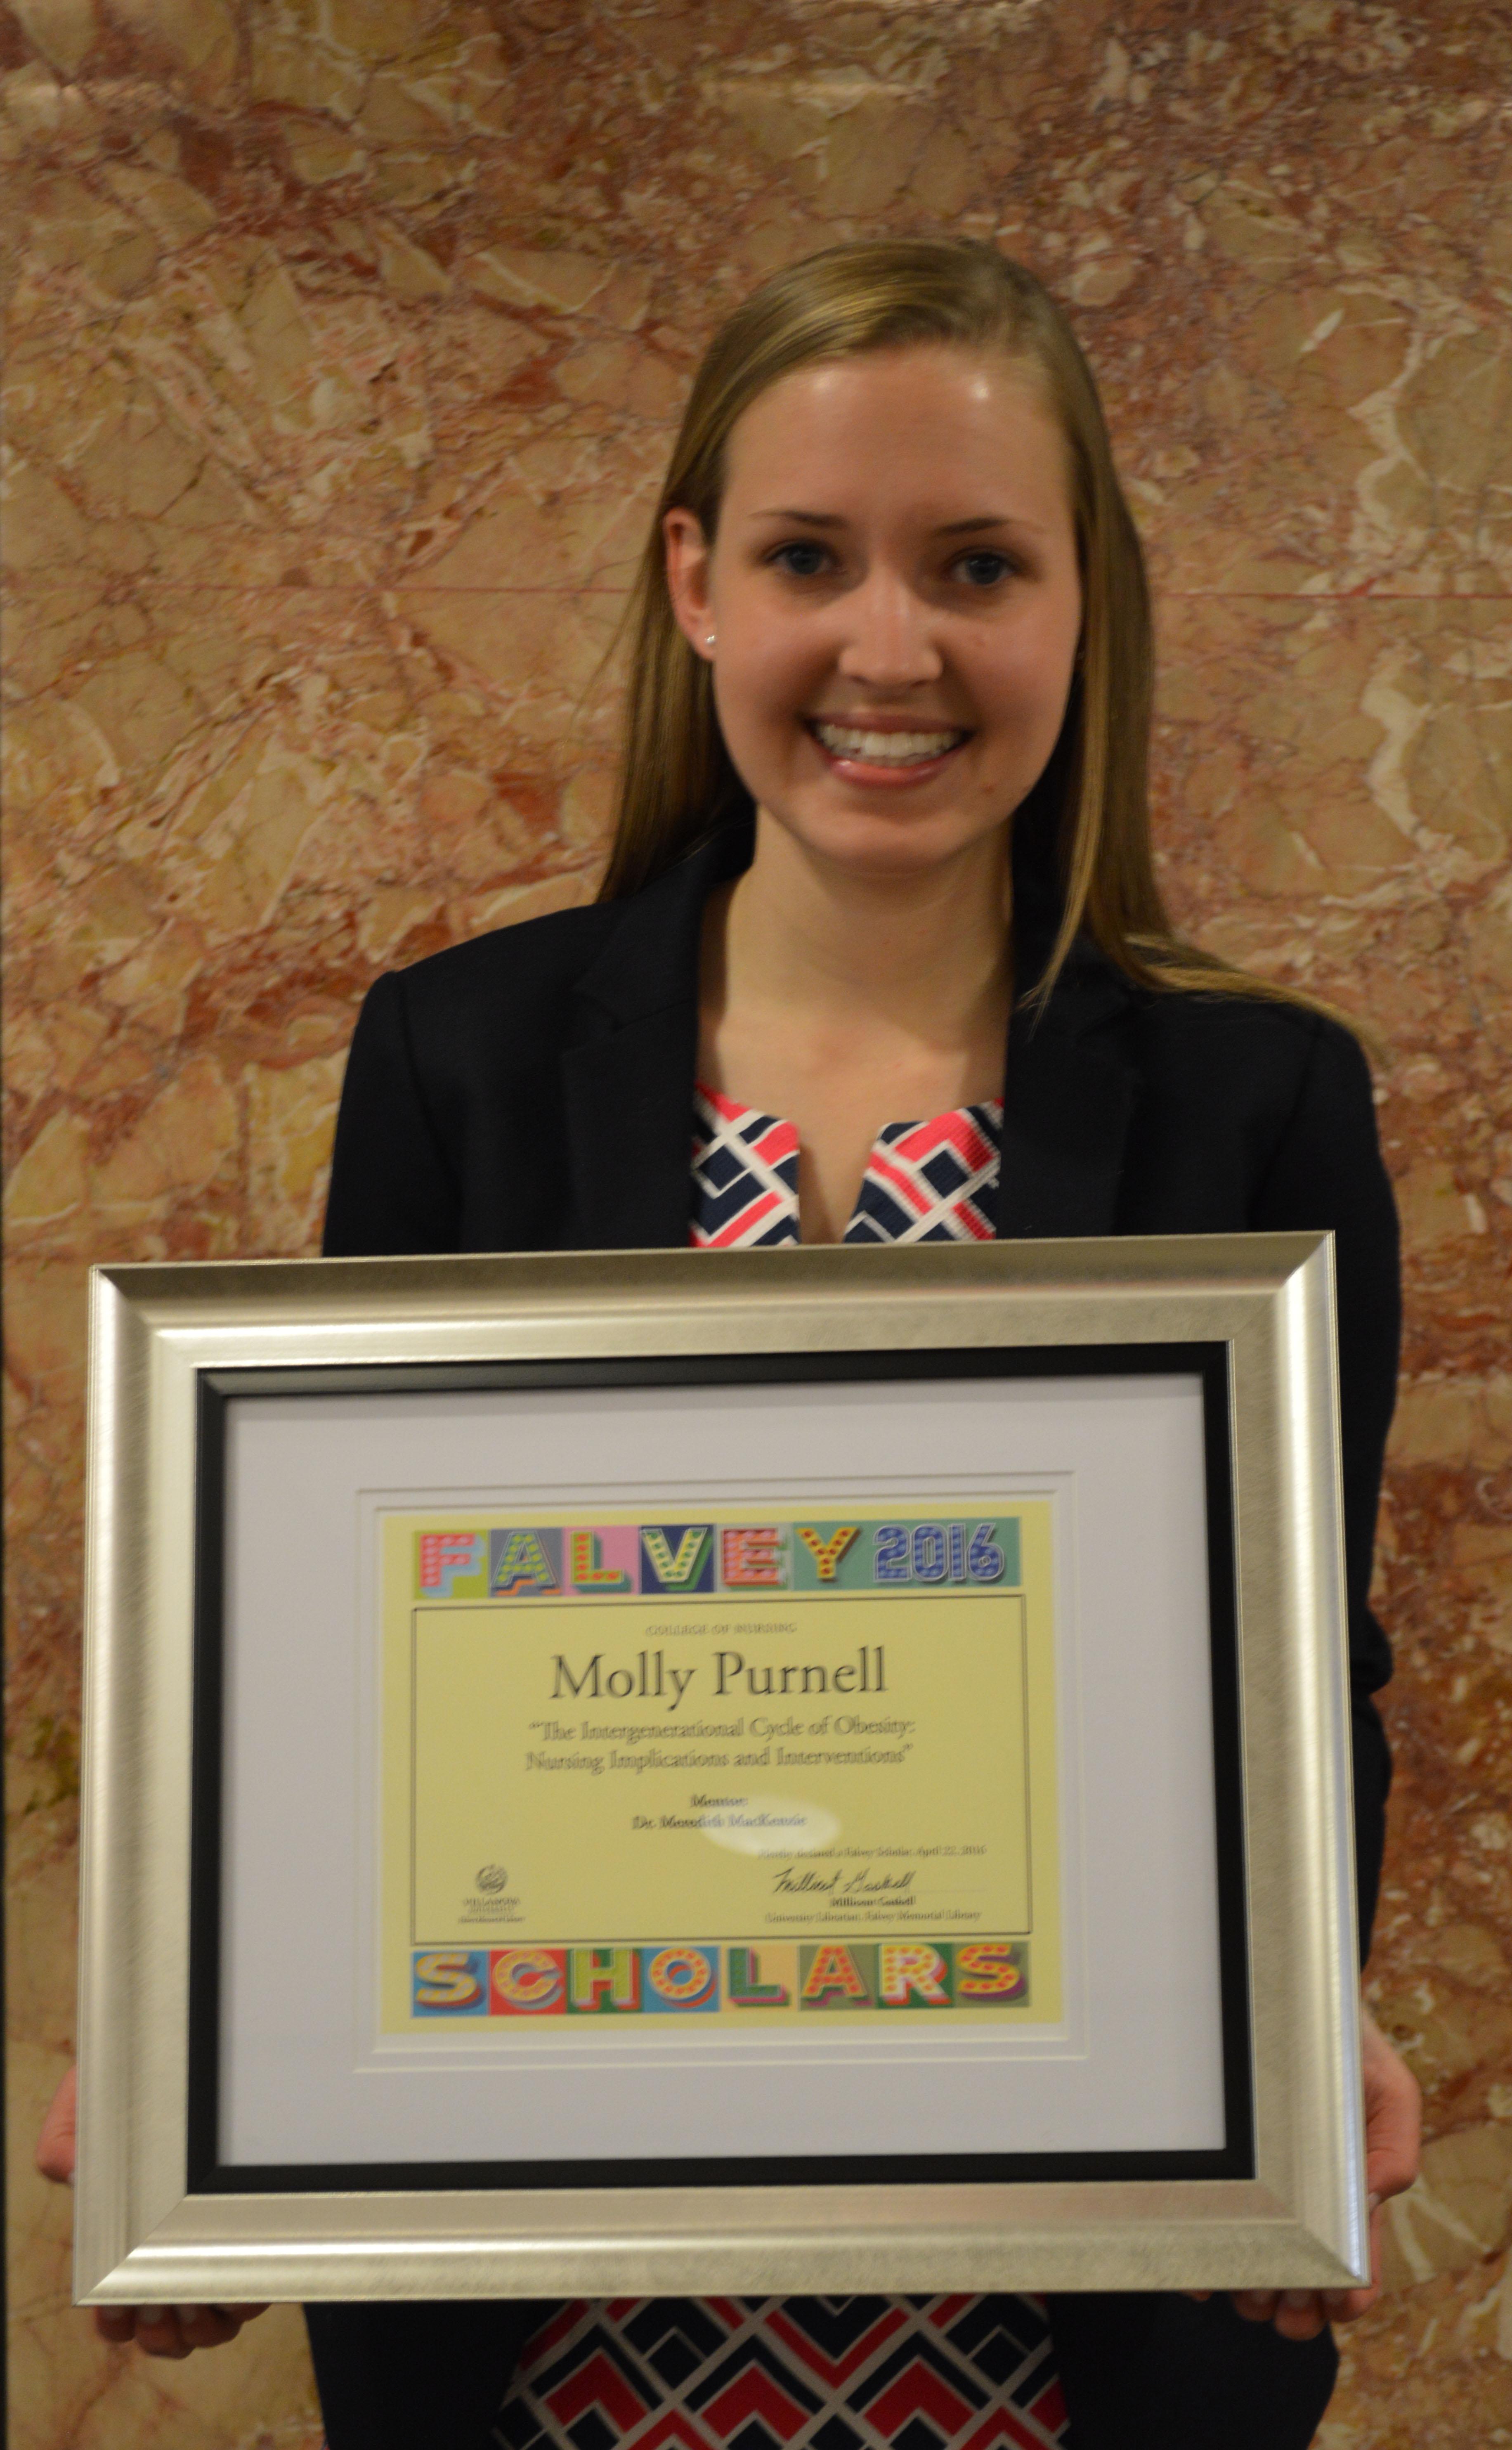 Molly Purnell, award, Falvey Scholars 2016